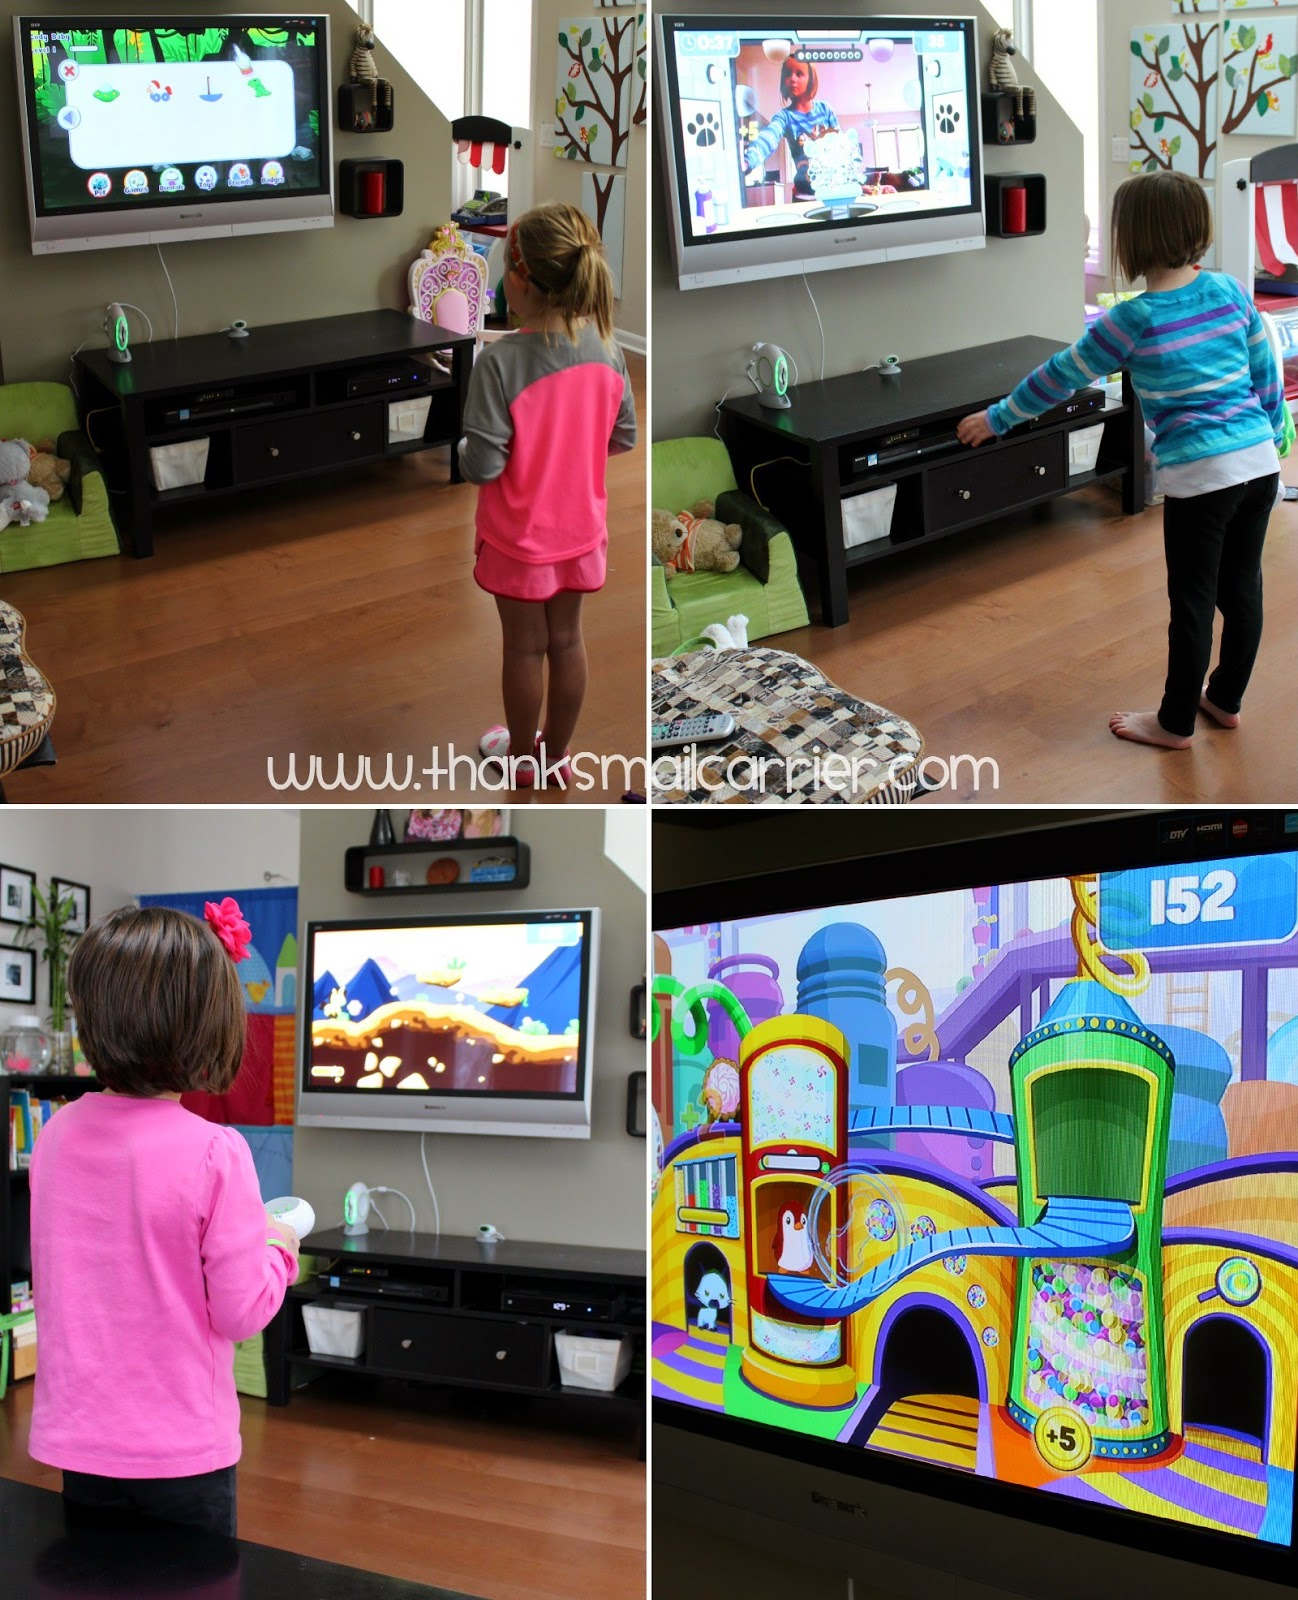 LeapTV Pet Play World